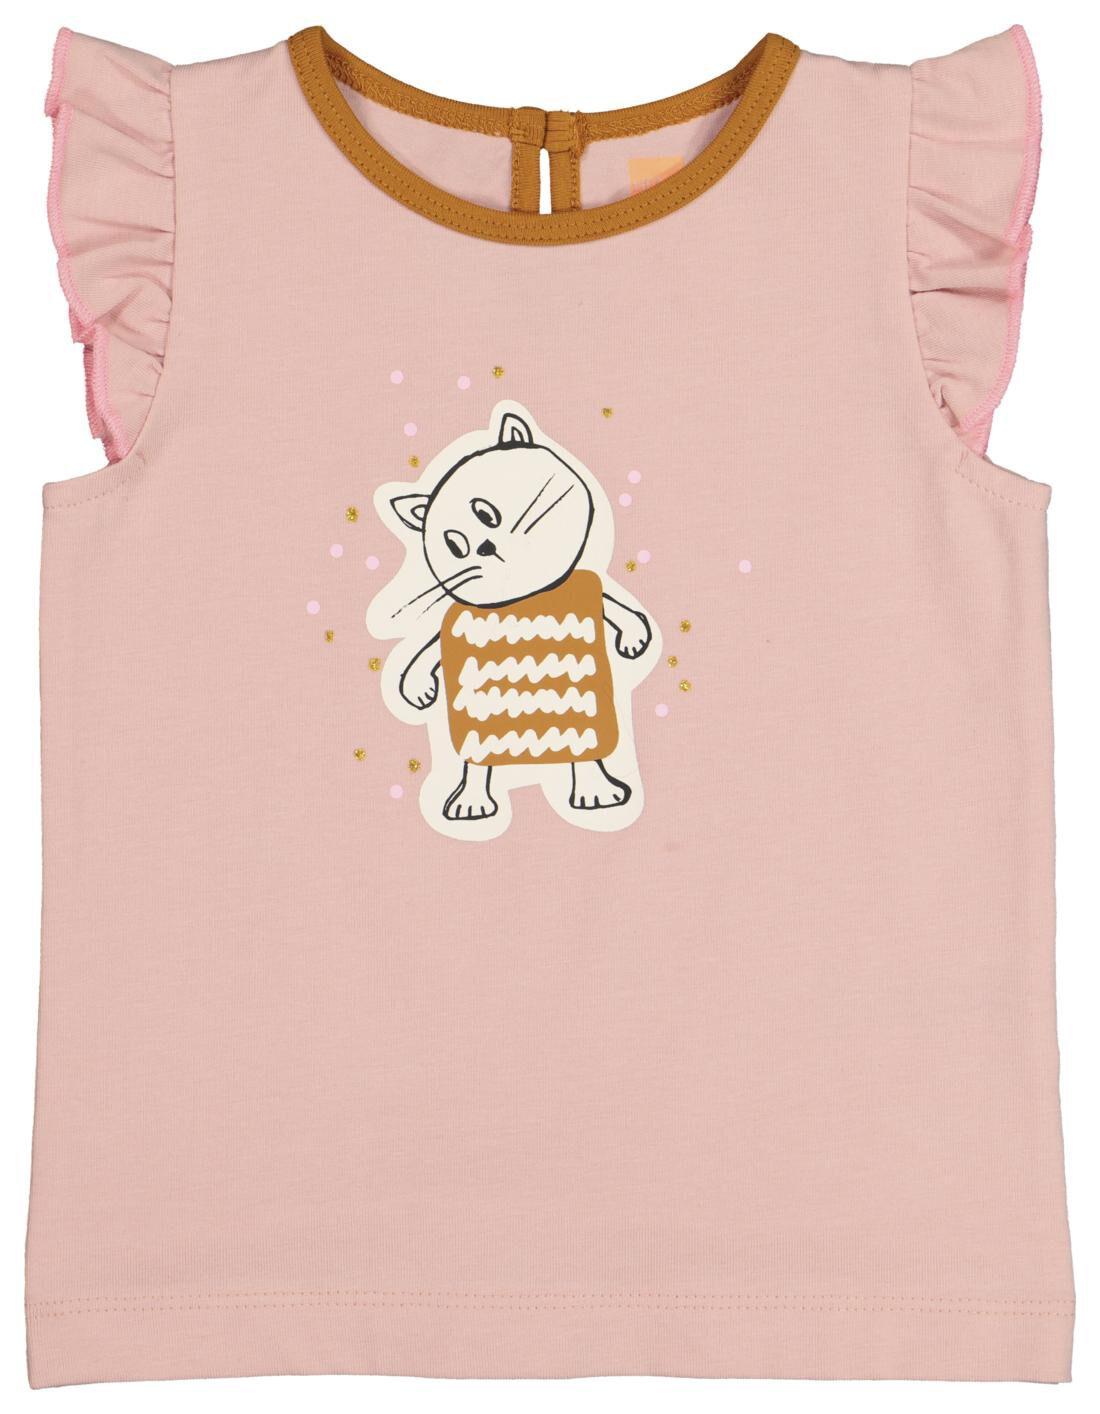 HEMA Baby T-shirt Lichtroze (lichtroze)